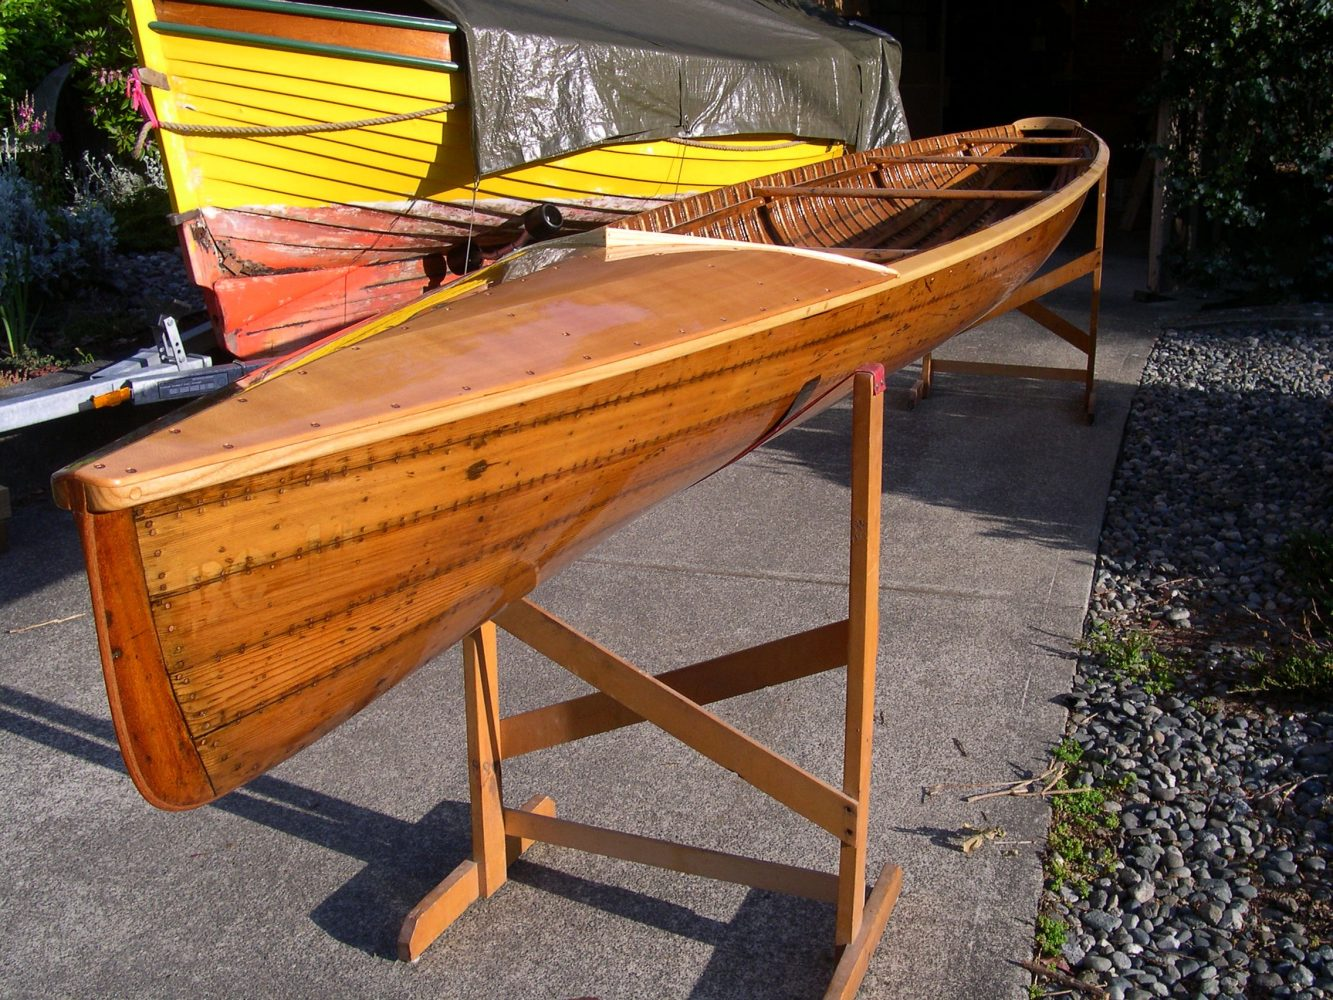 C4 canoe